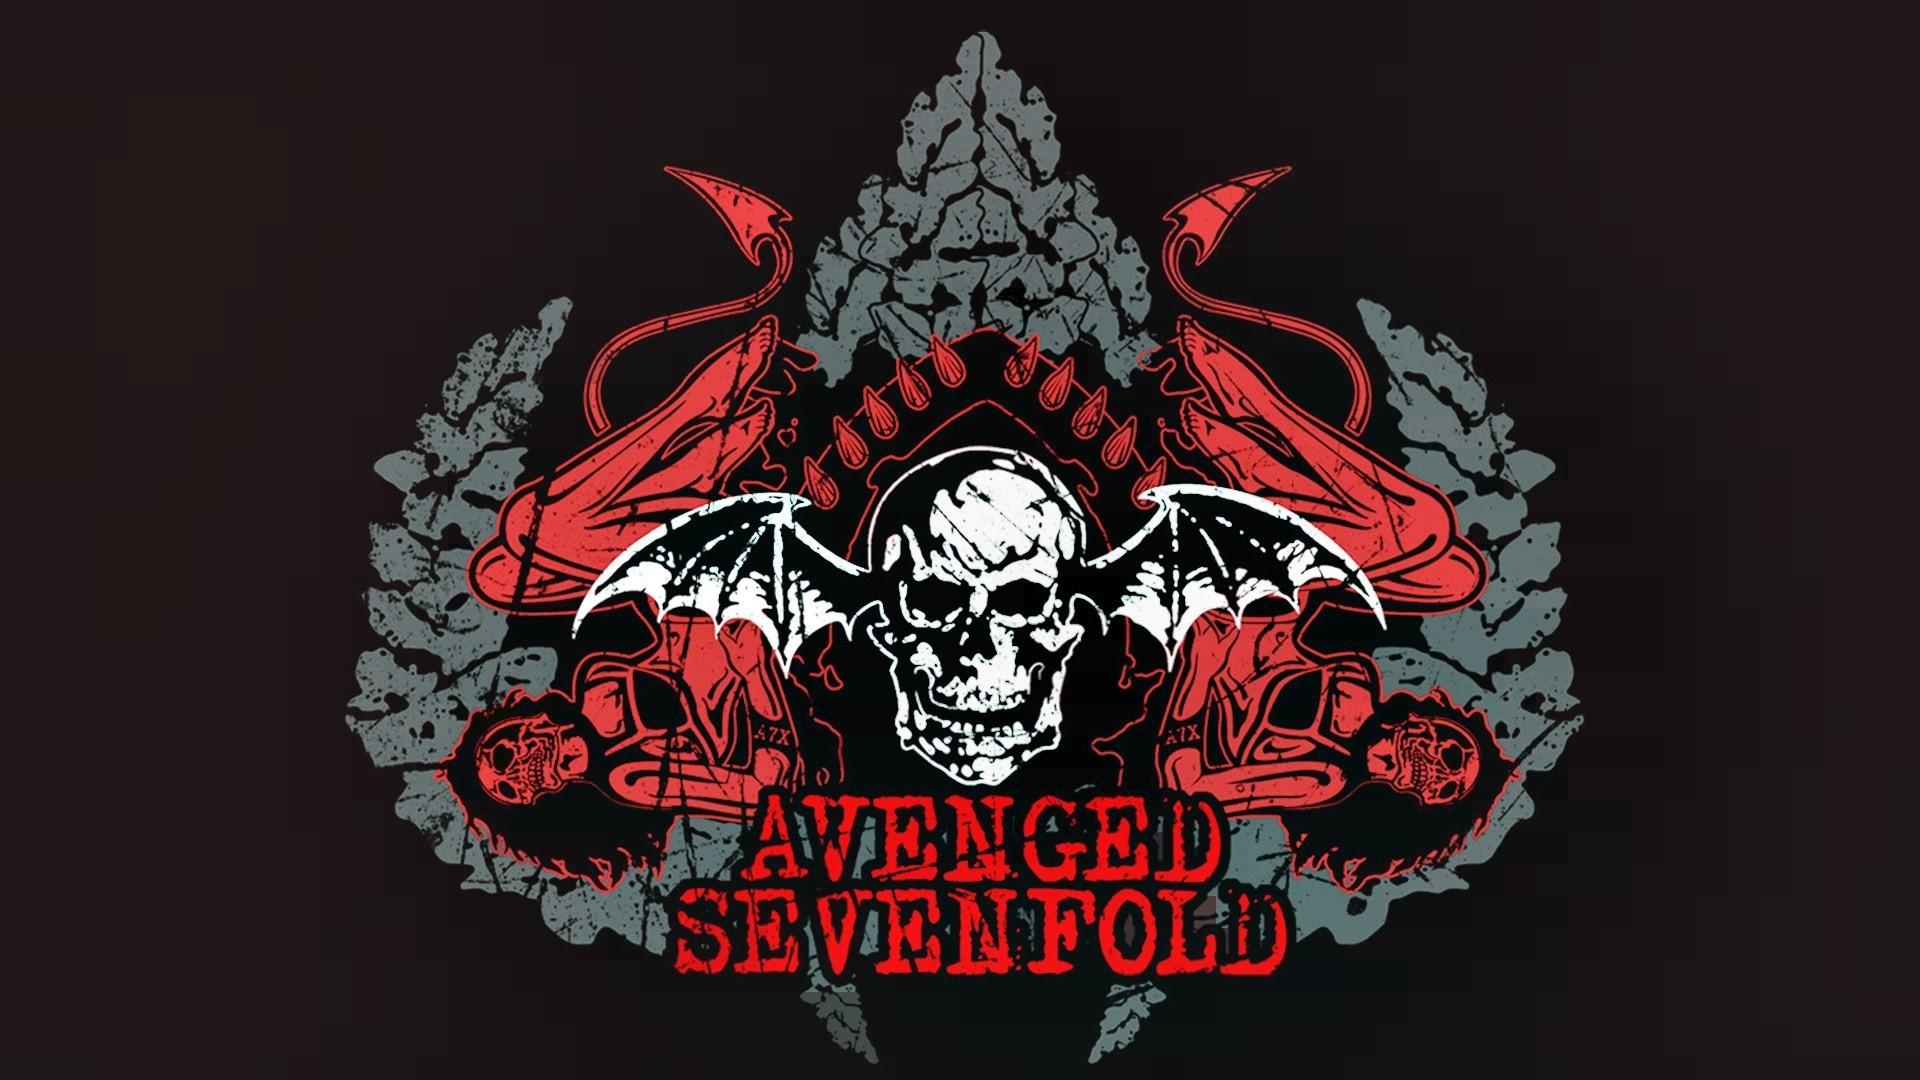 Avenged sevenfold hd wallpaper 1920x1080 labzada wallpaper avenged sevenfold wallpaper hd 66 images voltagebd Choice Image